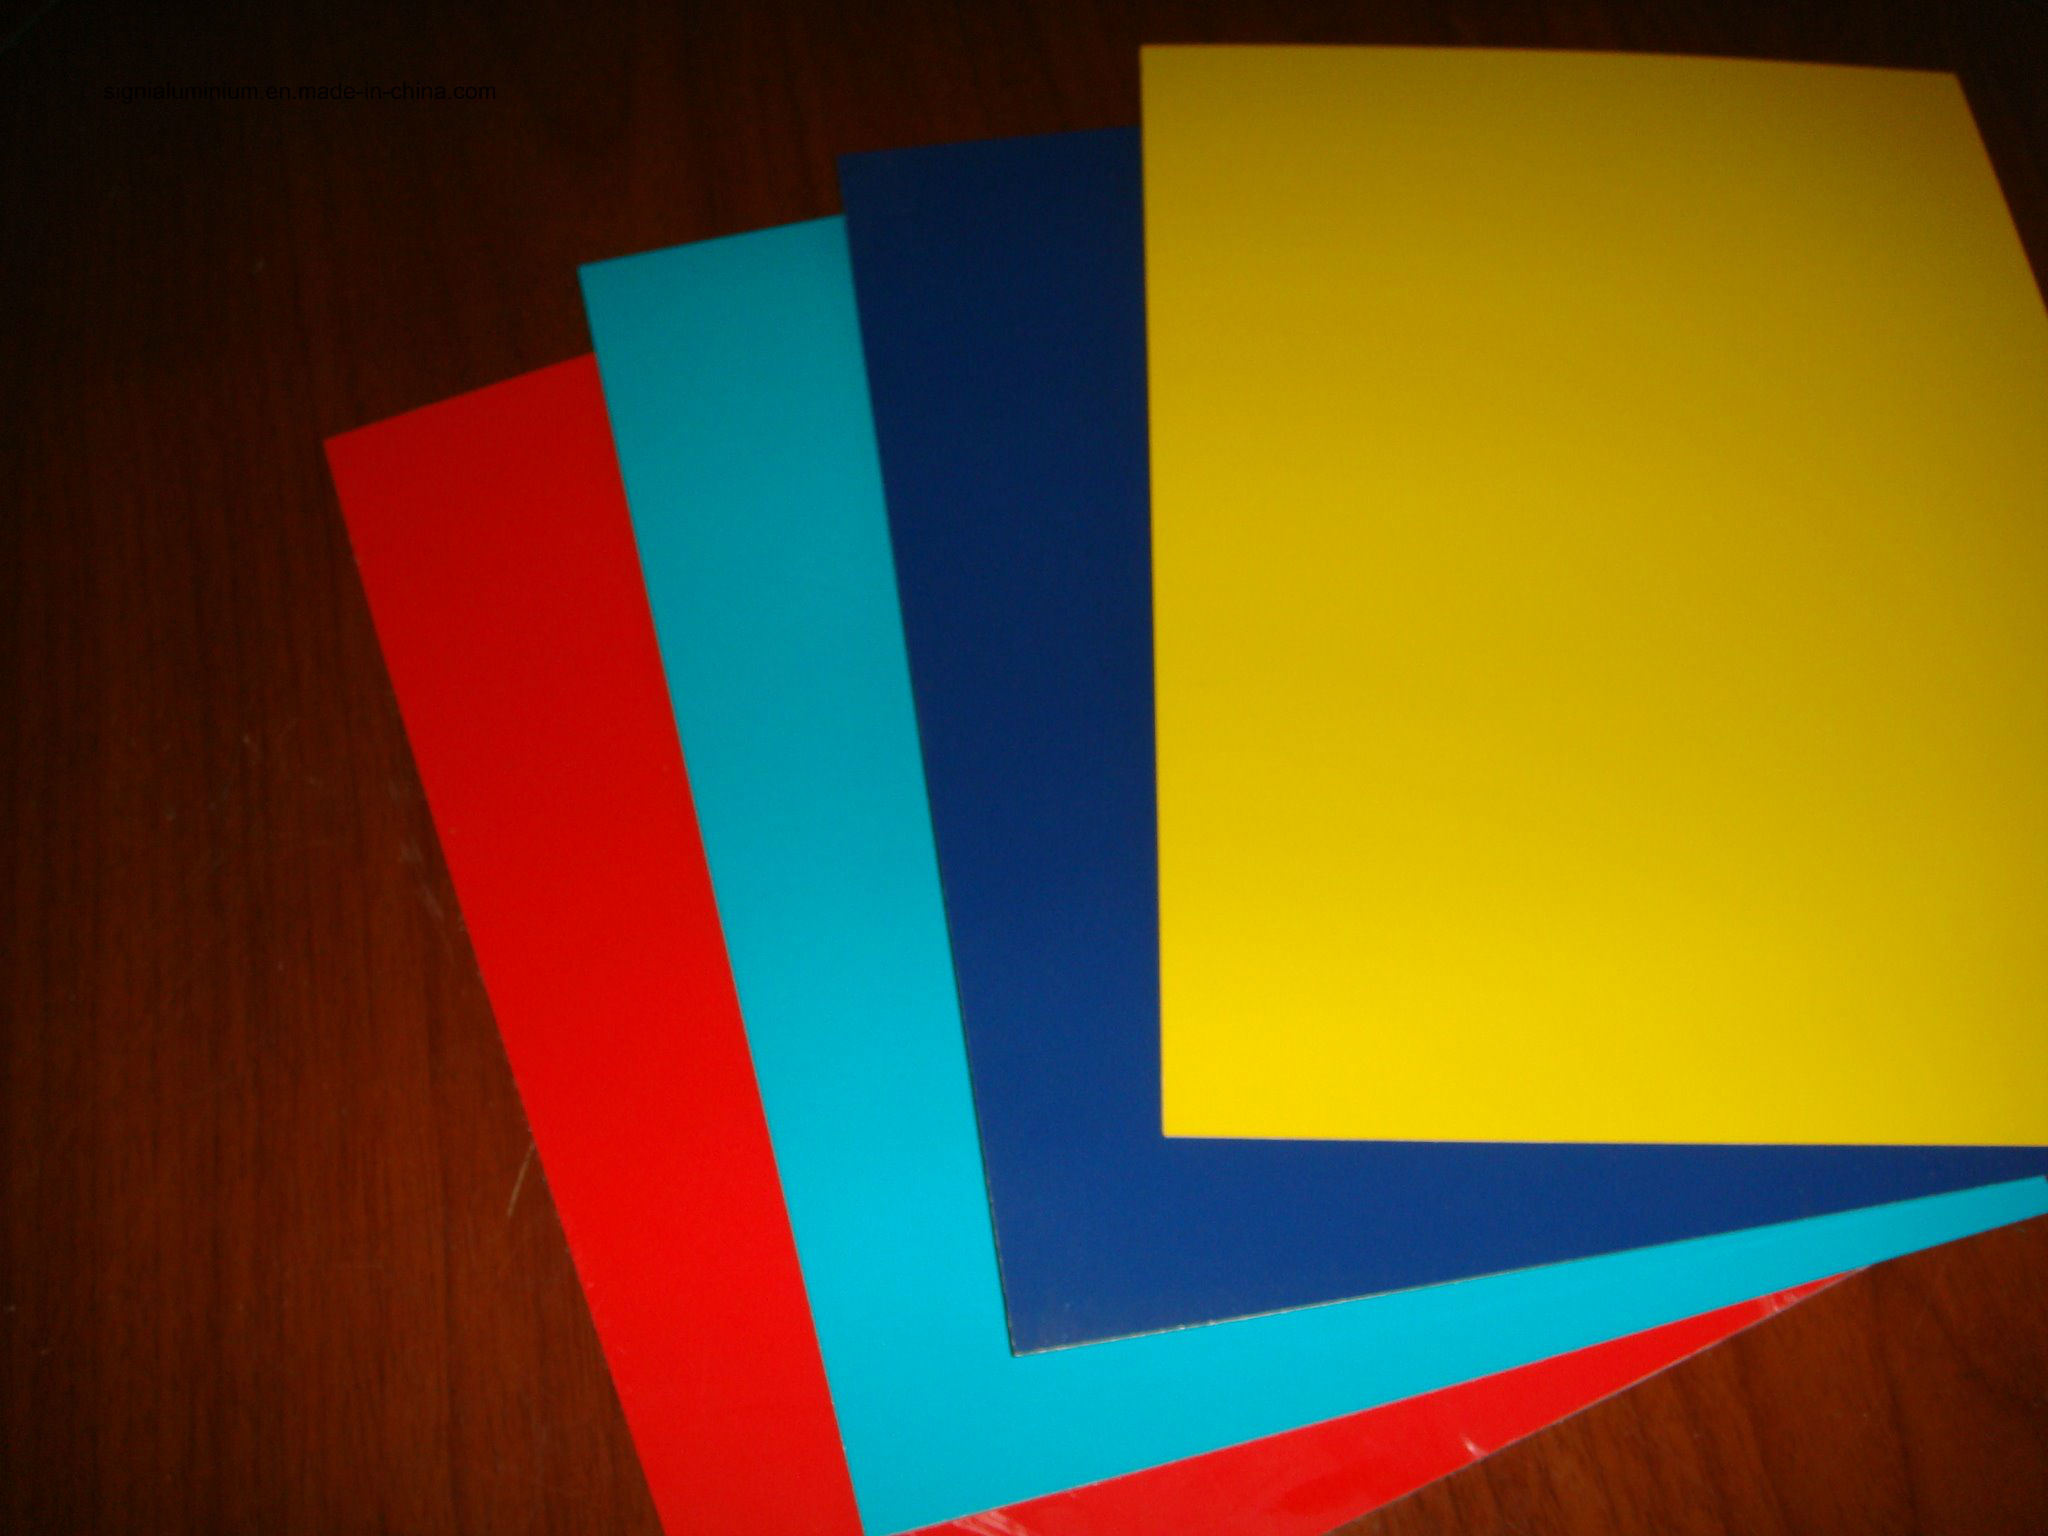 China Aluminium Sheet Price For Colour Coated Sheets China Aluminium Sheet Price For Colour Coated Sheets Colour Coated Sheets